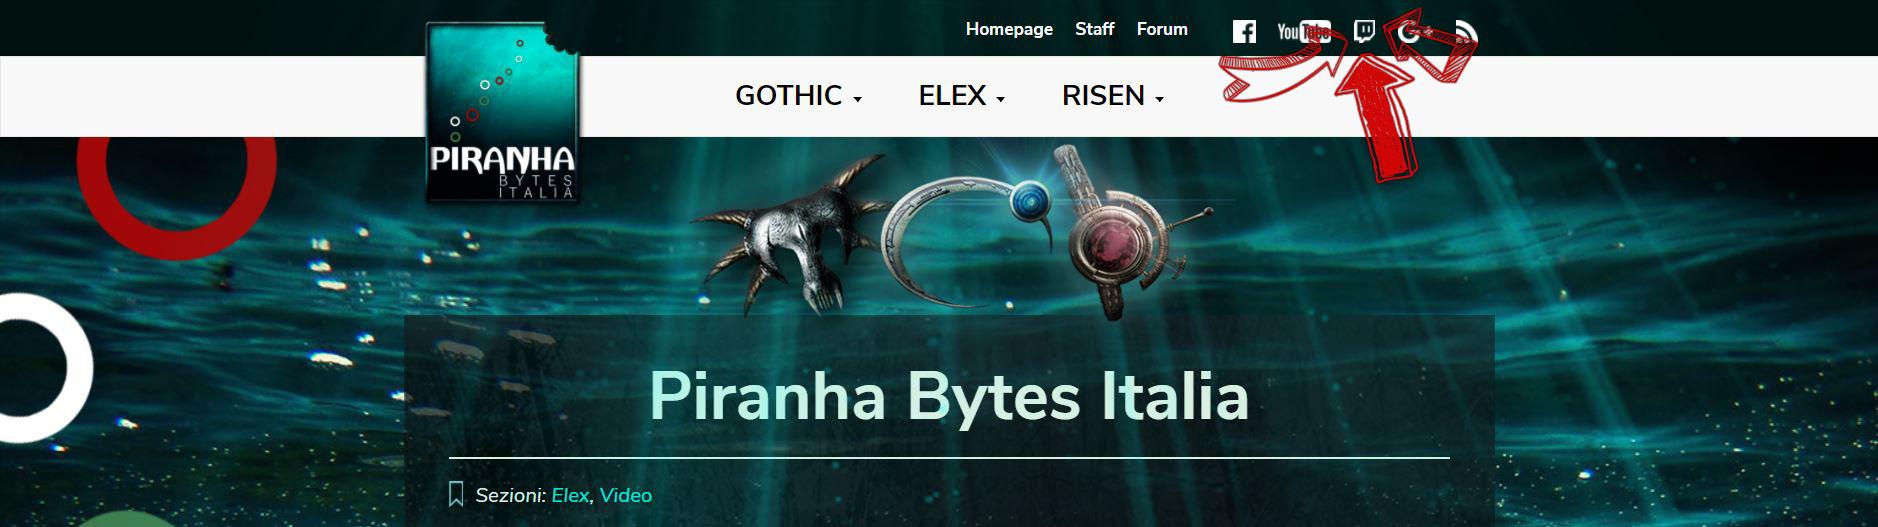 Piranhas bite